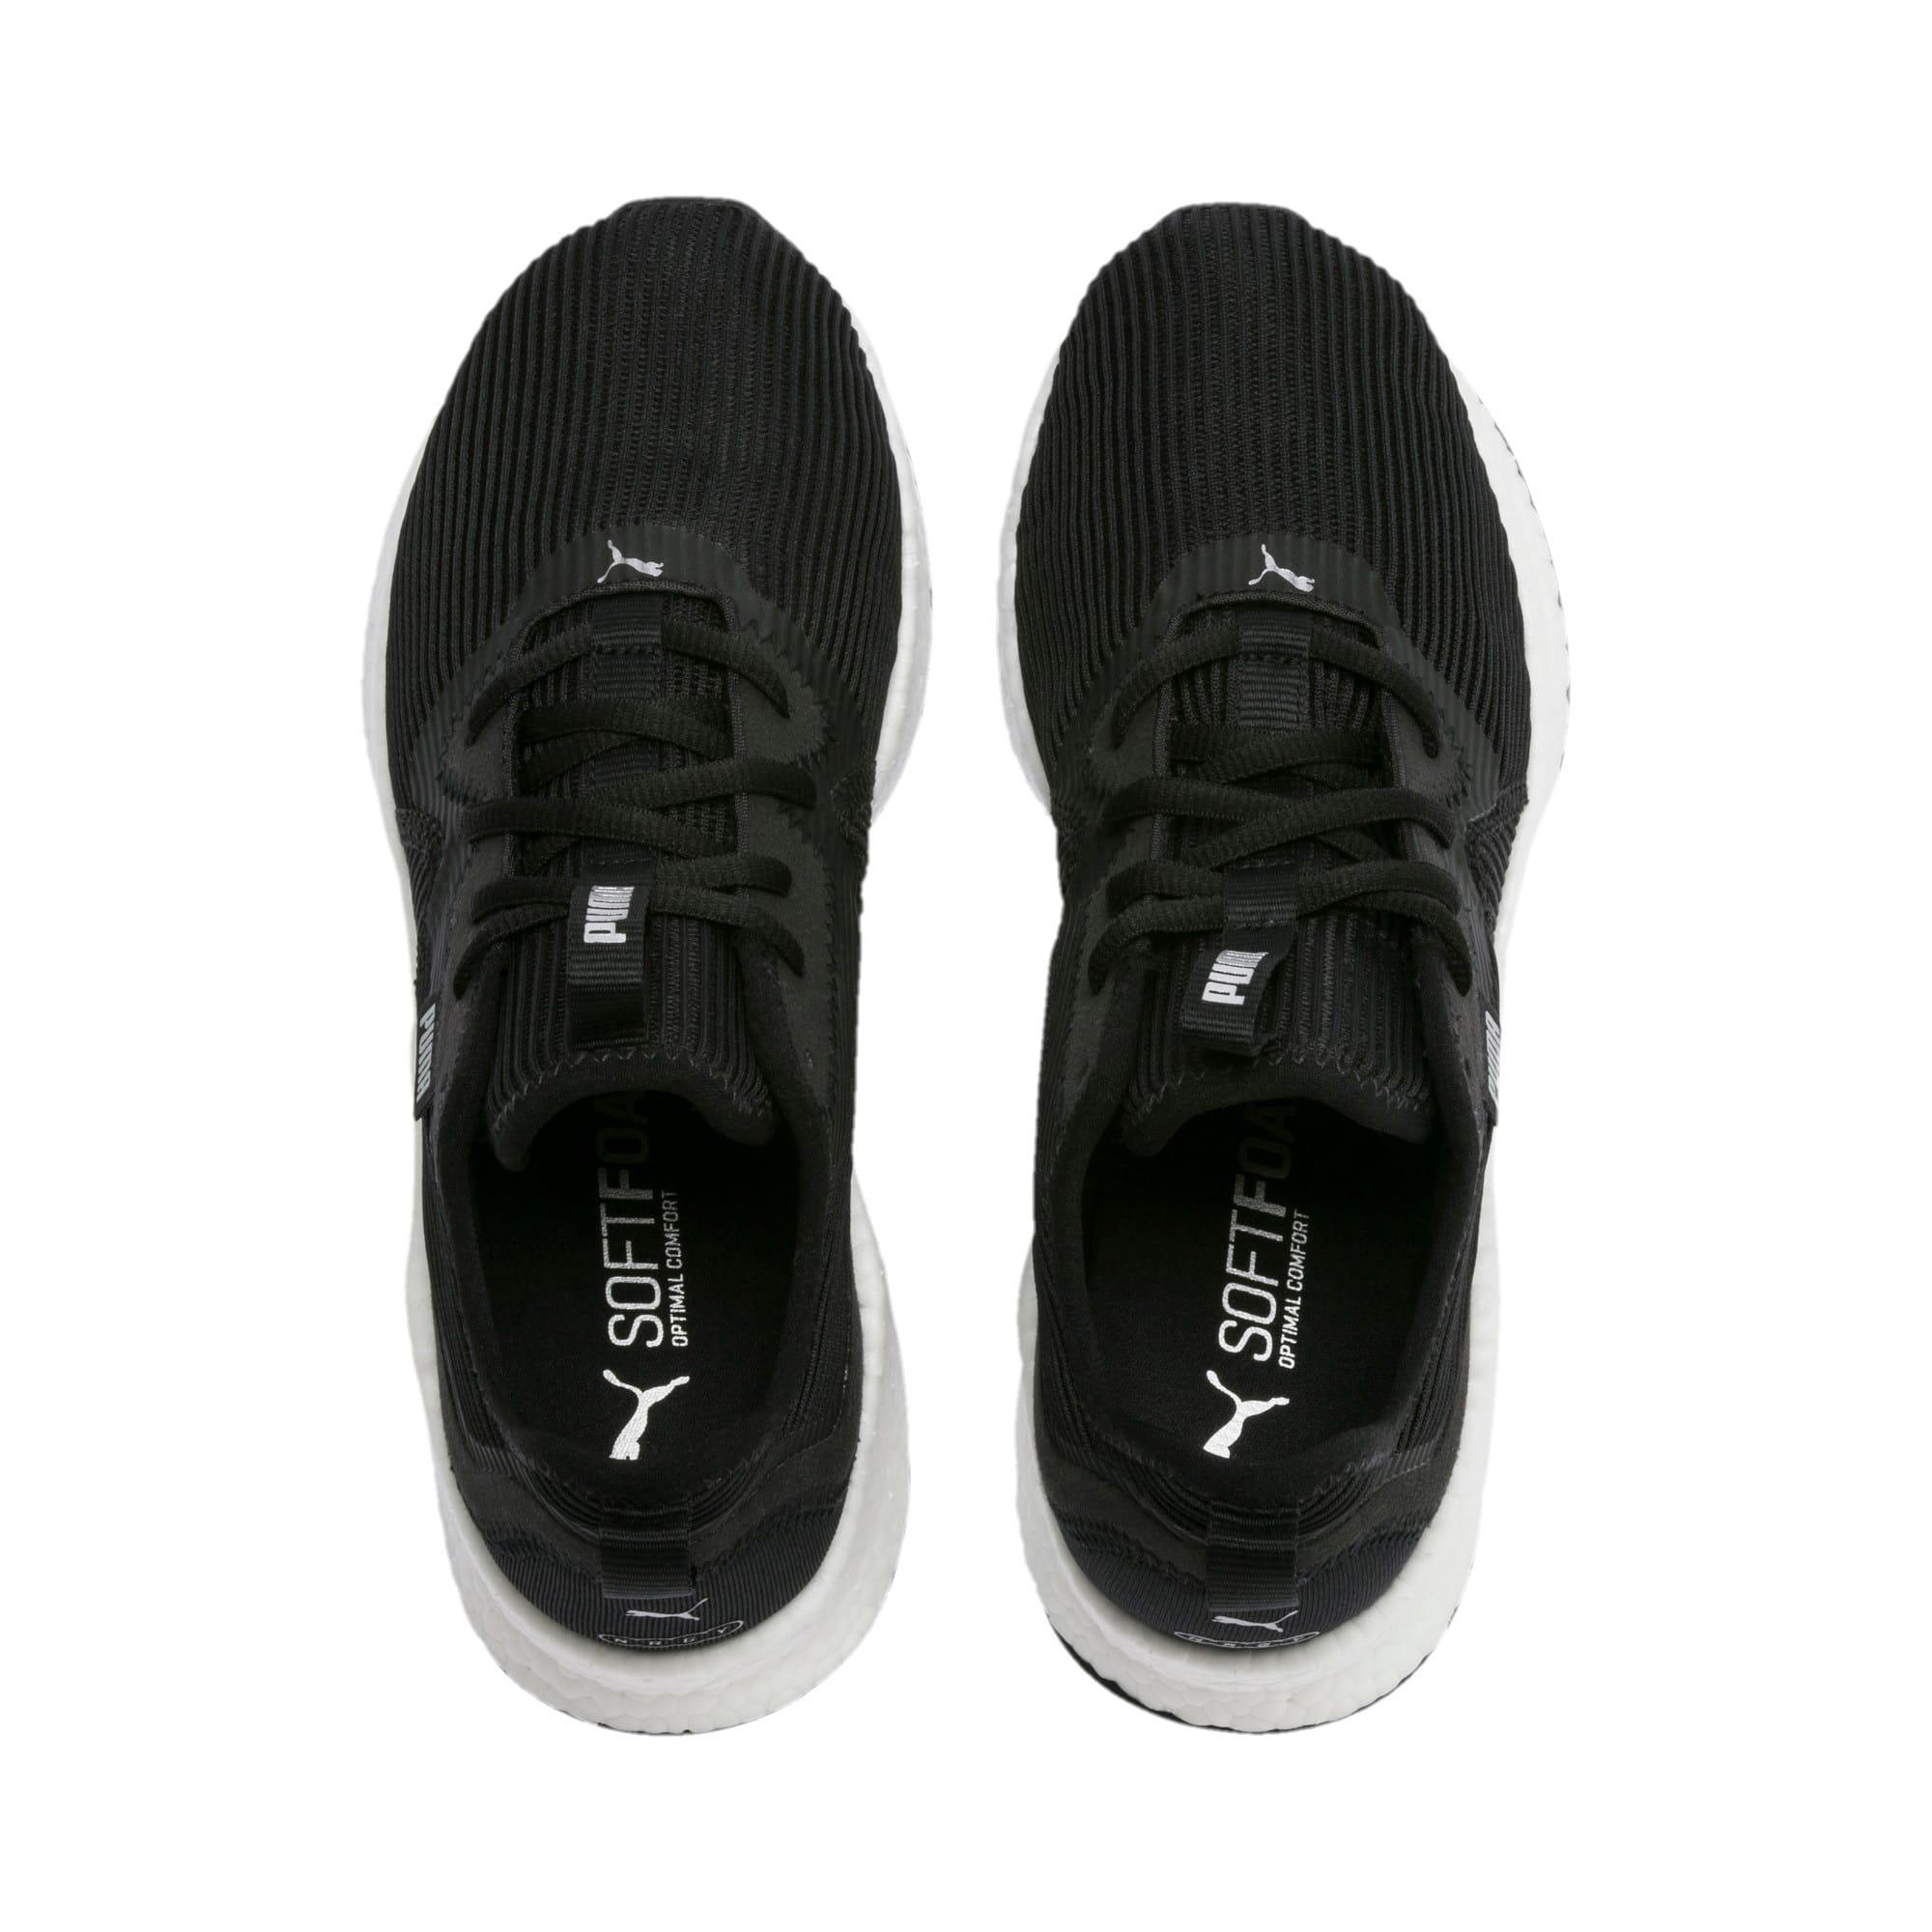 Thumbnail 4 of NRGY Star Femme Women's Running Shoes, Black-Silver-White, medium-IND